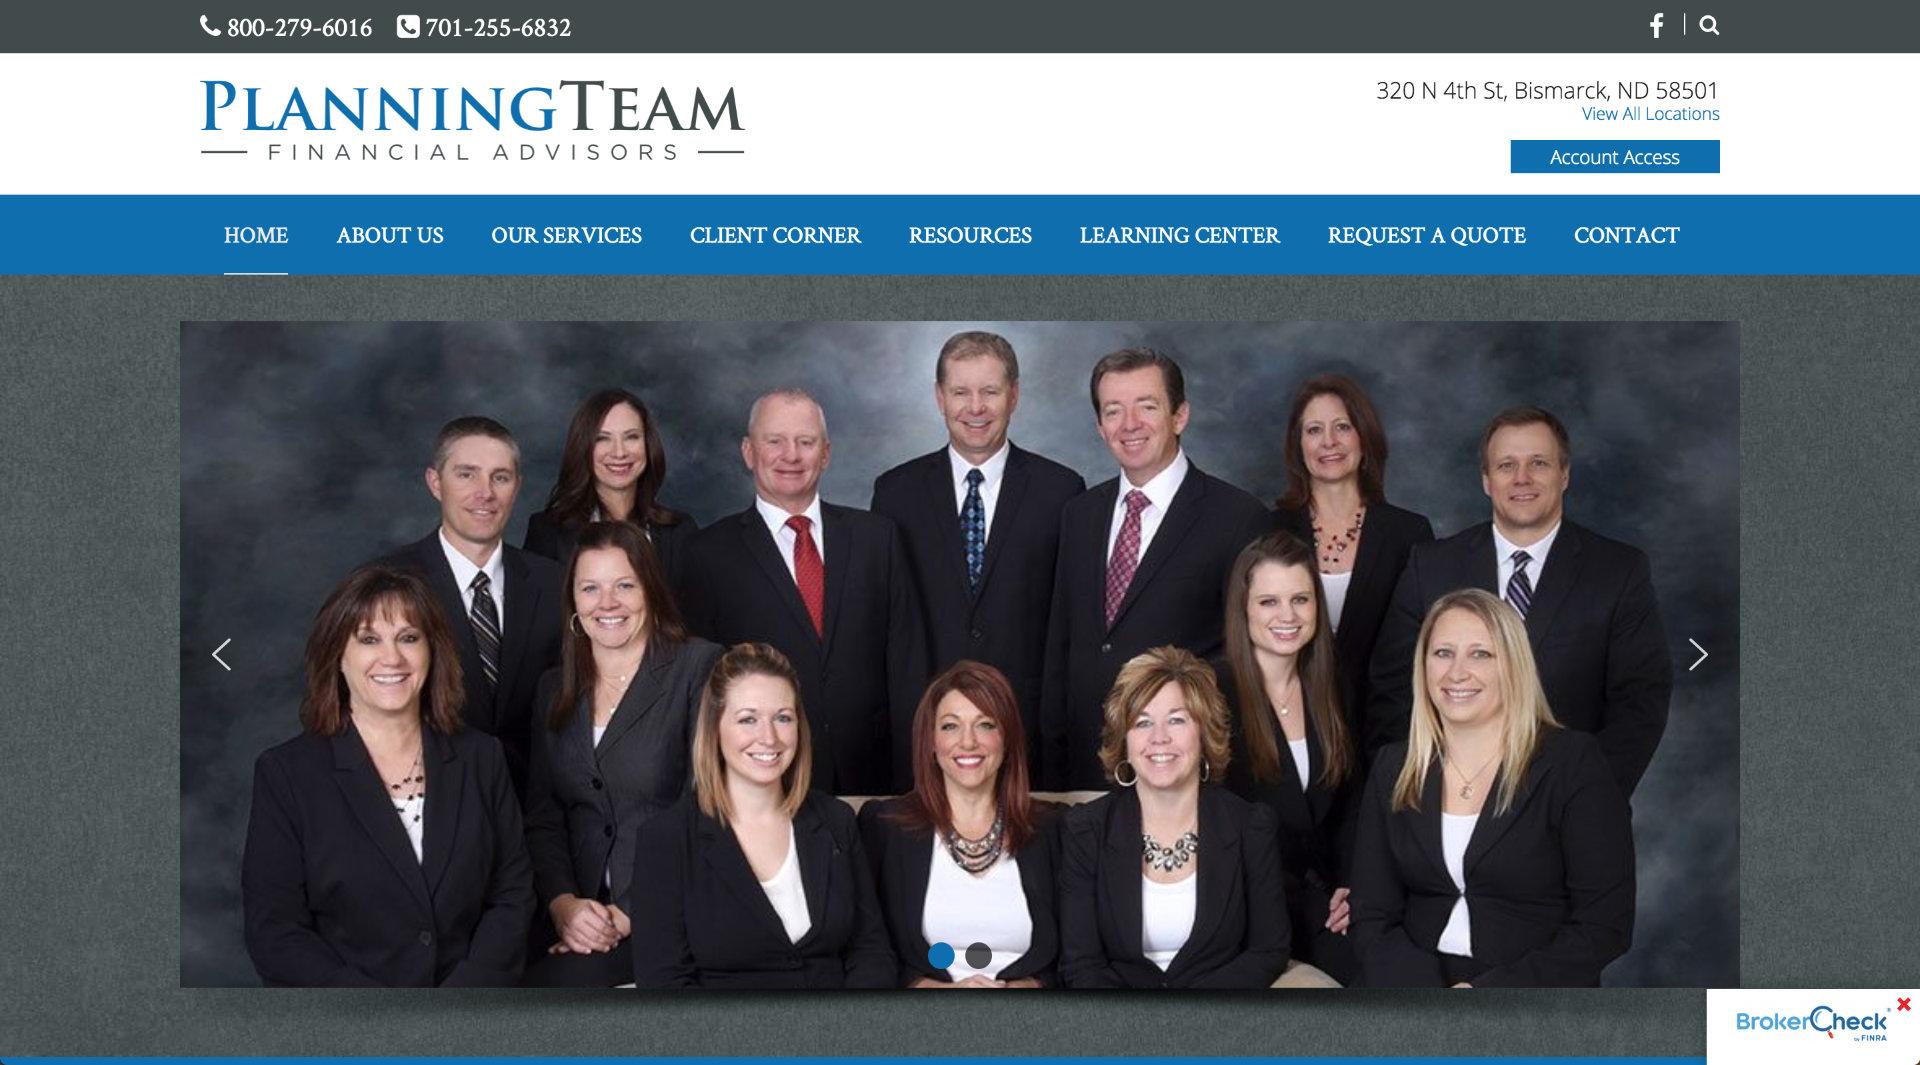 Planning Team Financial Advisors